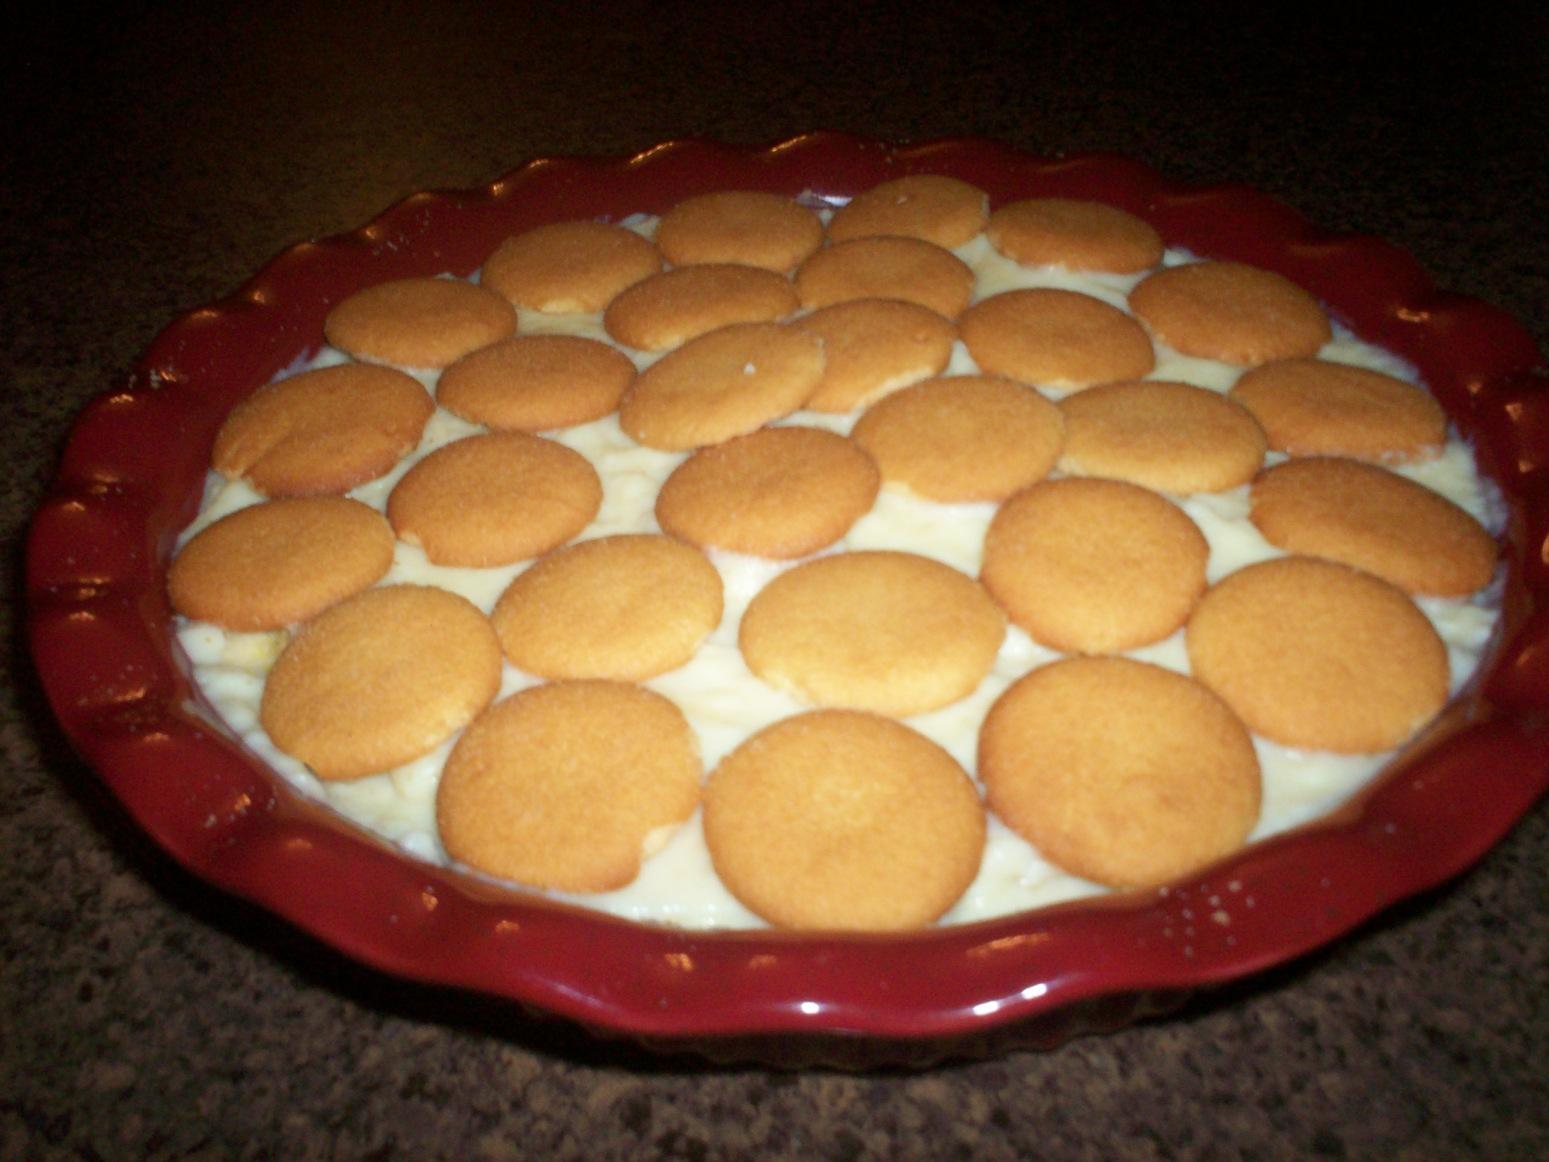 CREAMY BANANA PUDDING Recipe